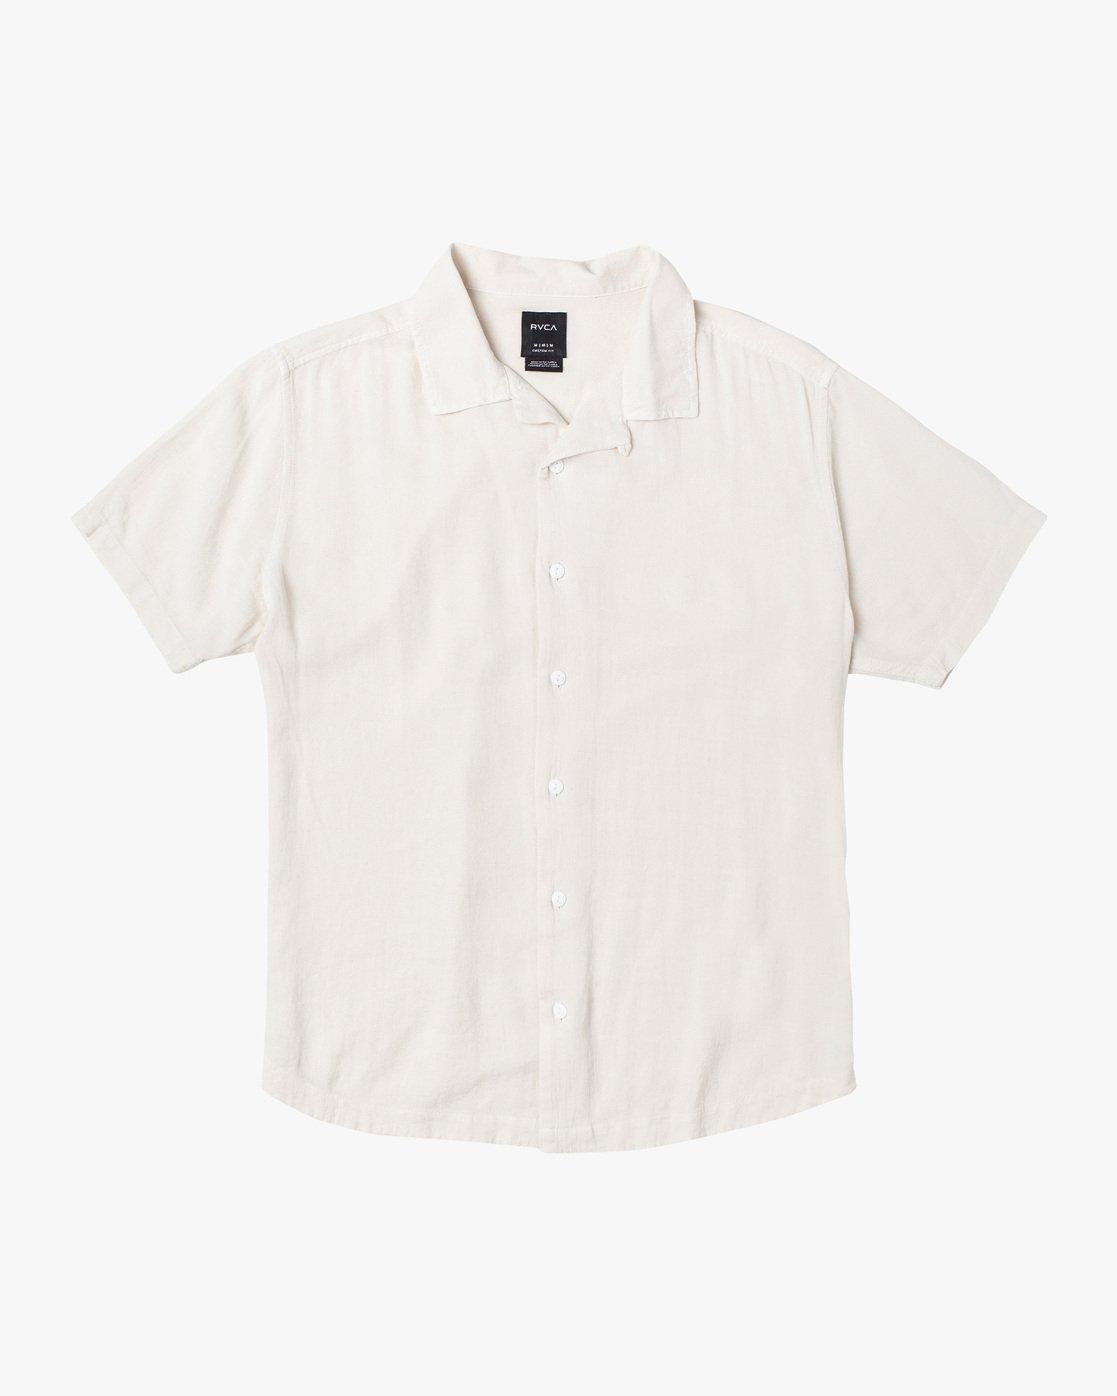 0 BEAT SHORT SLEEVE SHIRT White M5143RBS RVCA